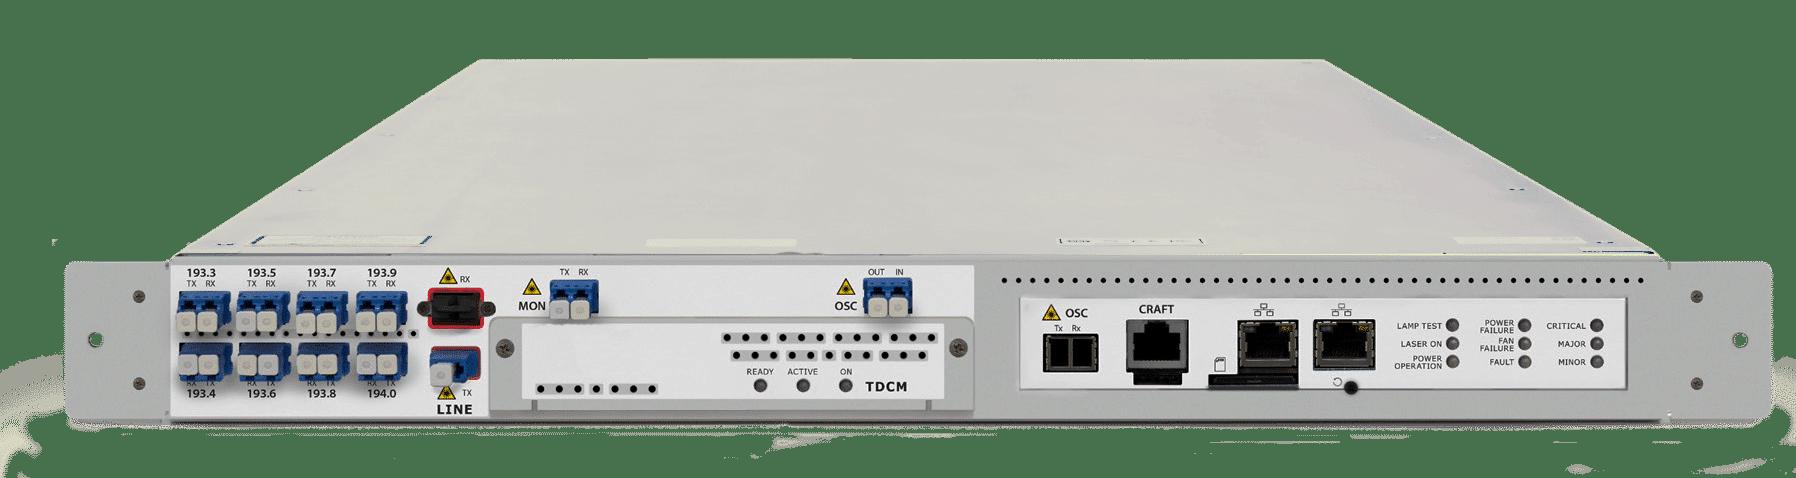 8ch 100G Active DWDM Open Line System